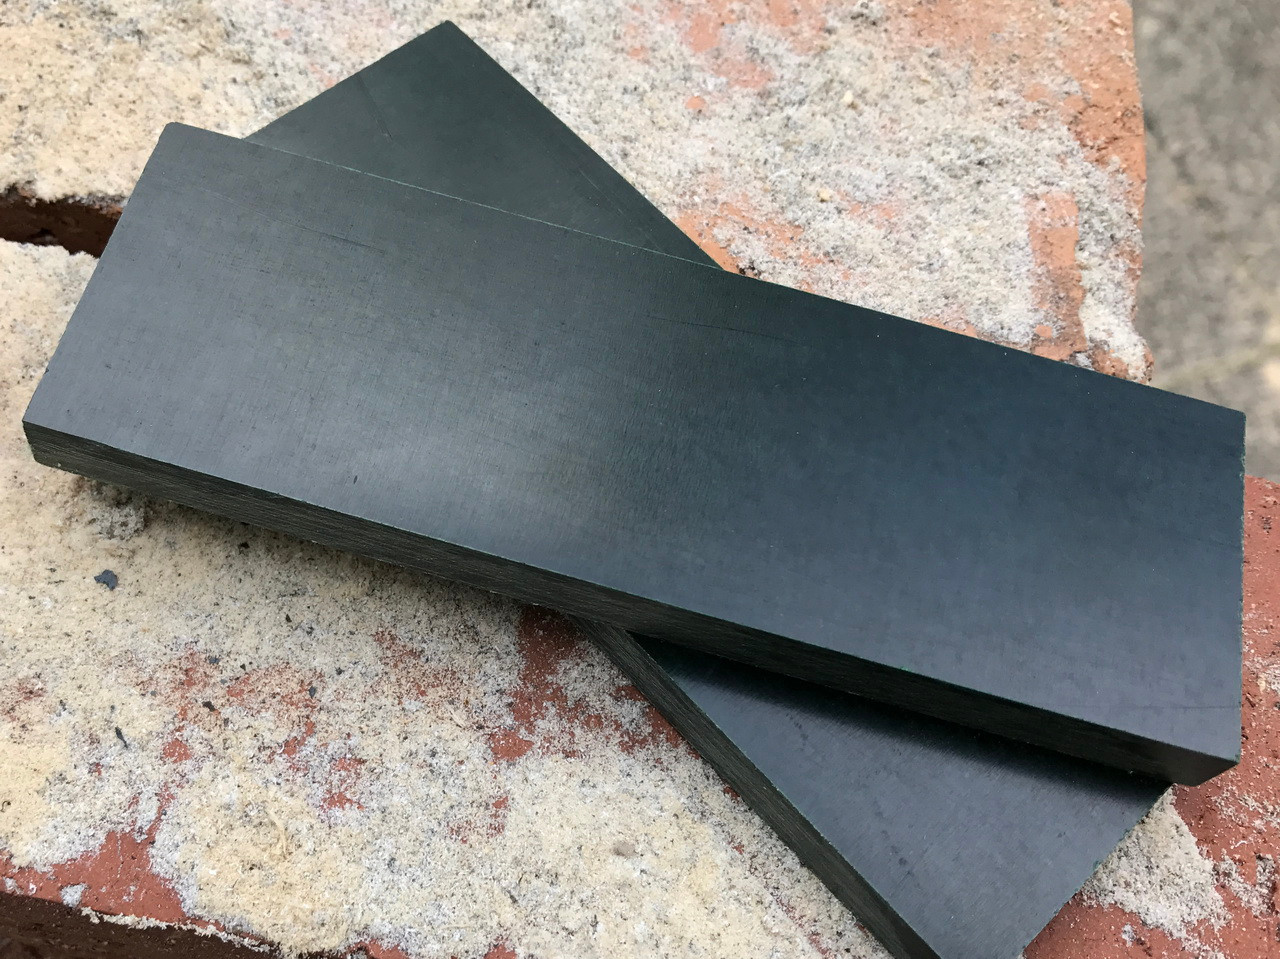 Green Linen Micarta Handle Scales X 2 8 Mm Creative Man